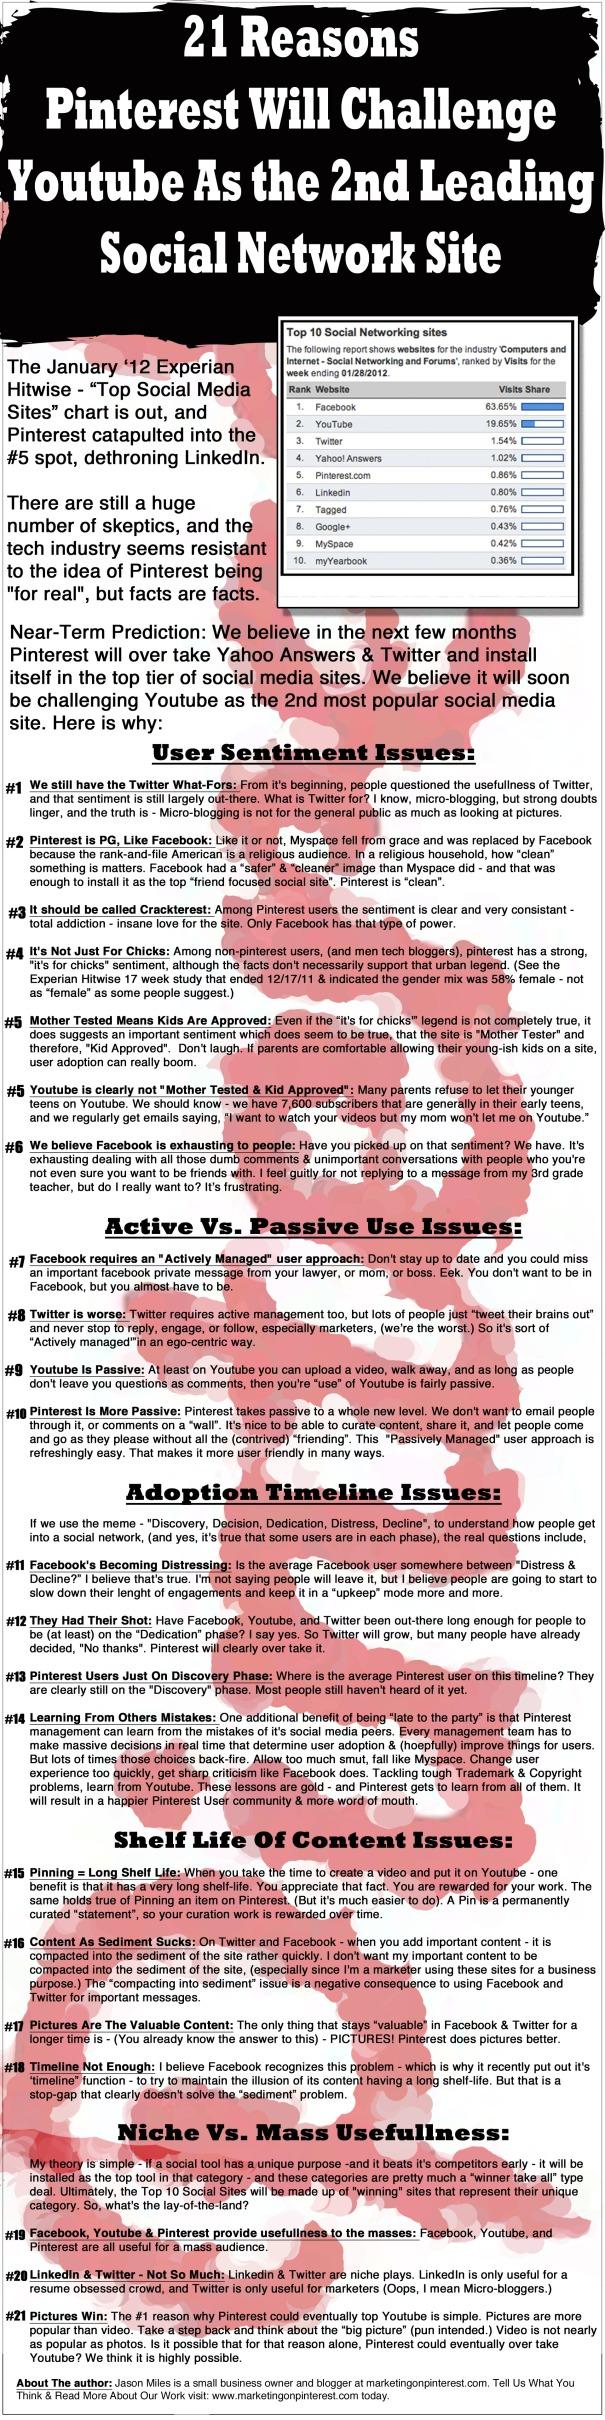 Pinterest 21 reasons infographic